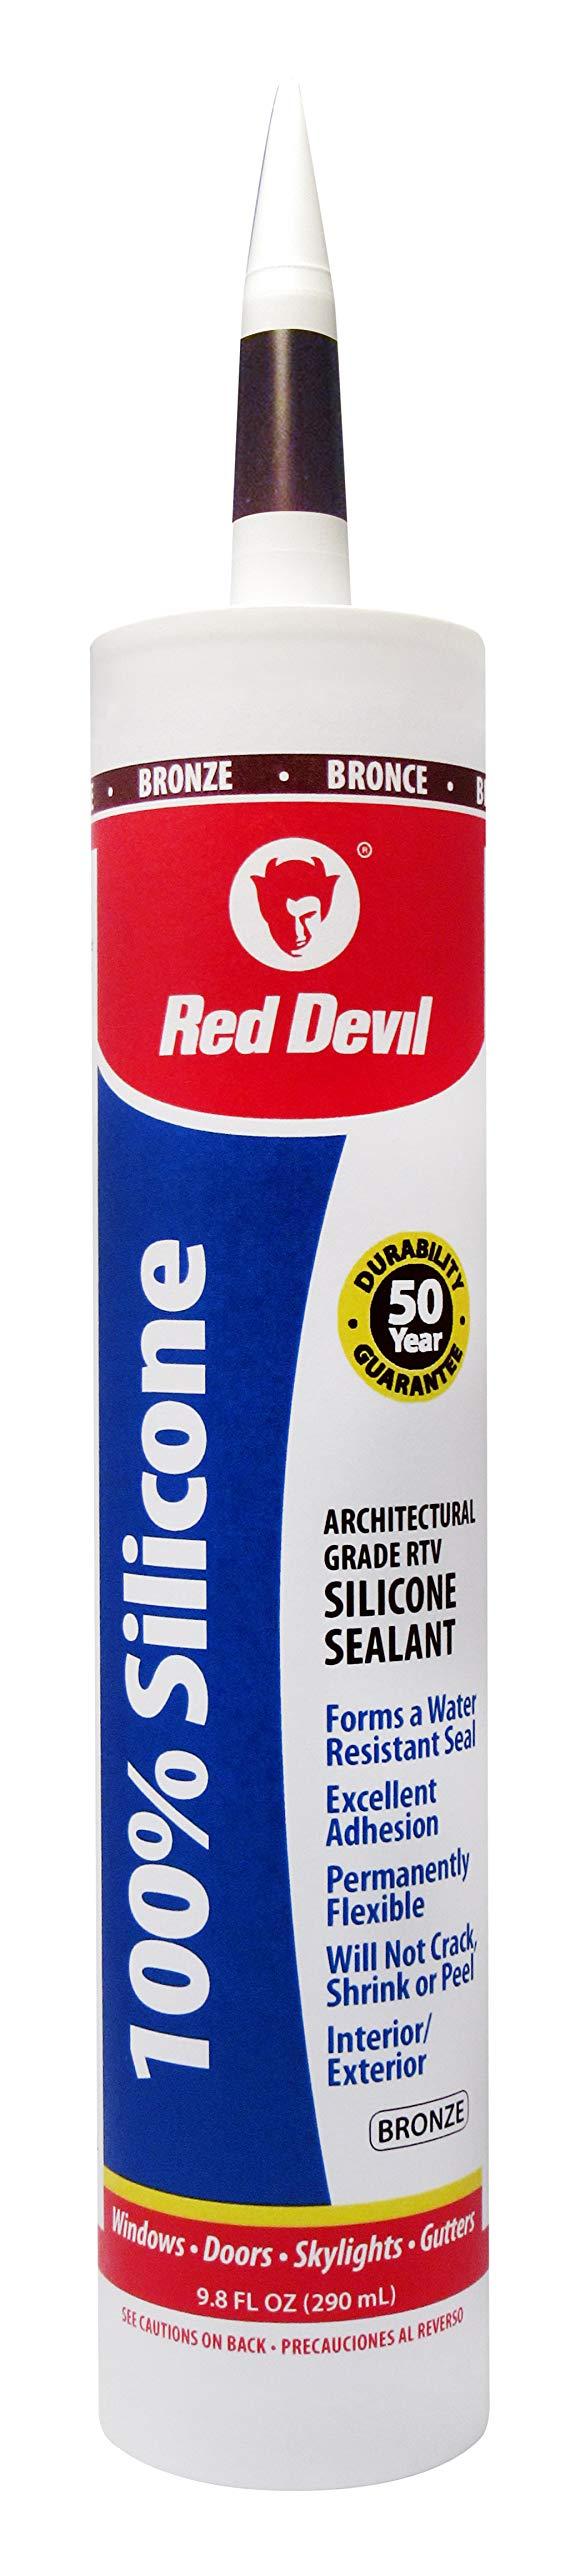 Red Devil 08164012 Architectural Grade 50 Year 100% Silicone Sealant, Bronze, 9.8 oz Cartridge, Case of 12